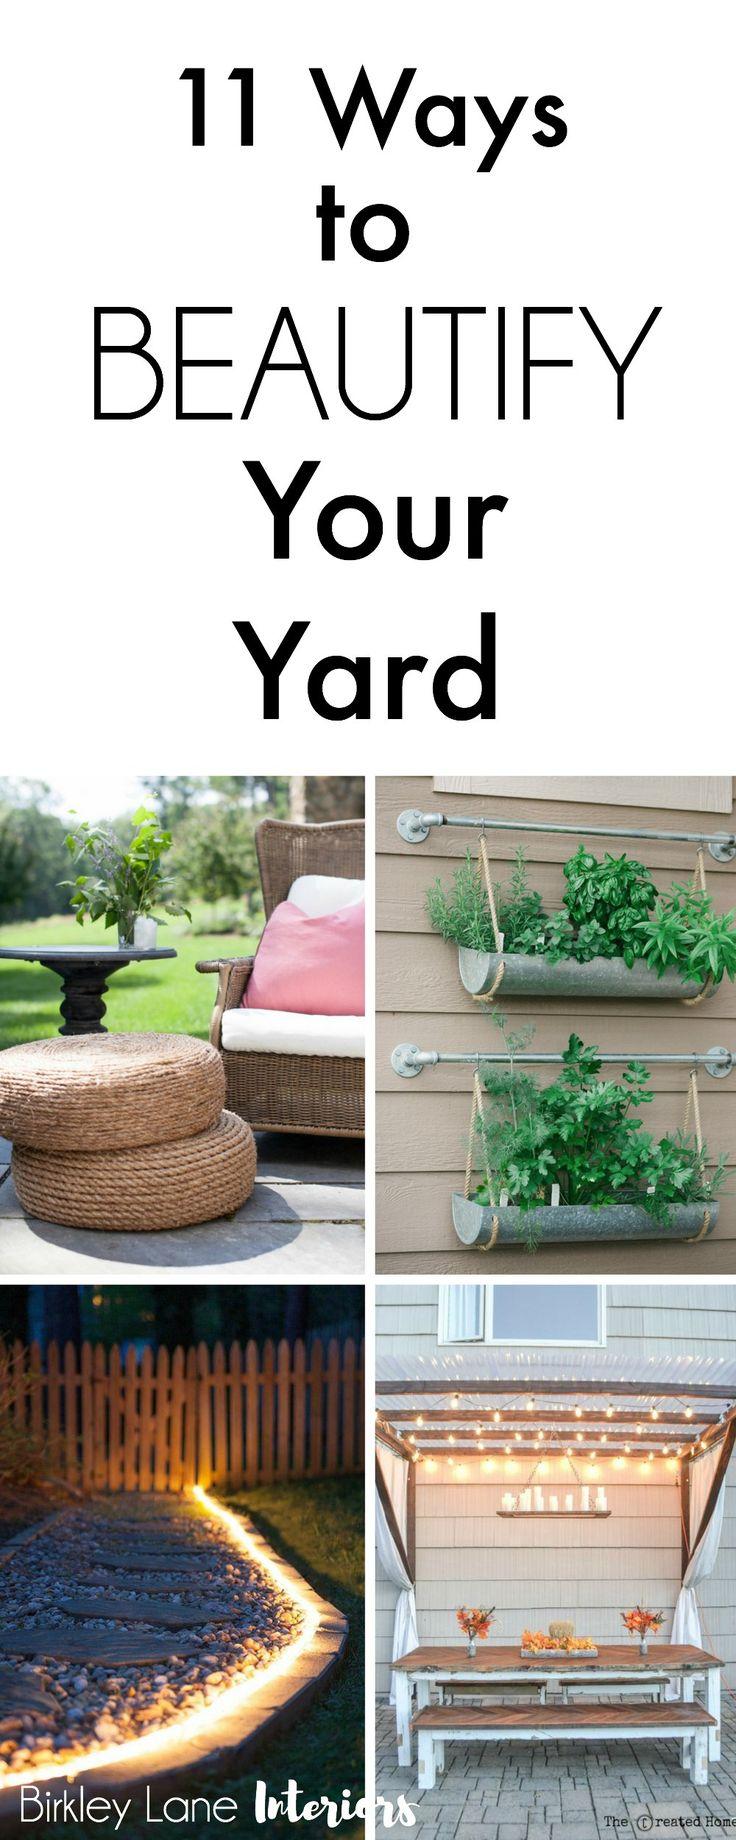 best Backyardlandscape garden ideas images on Pinterest